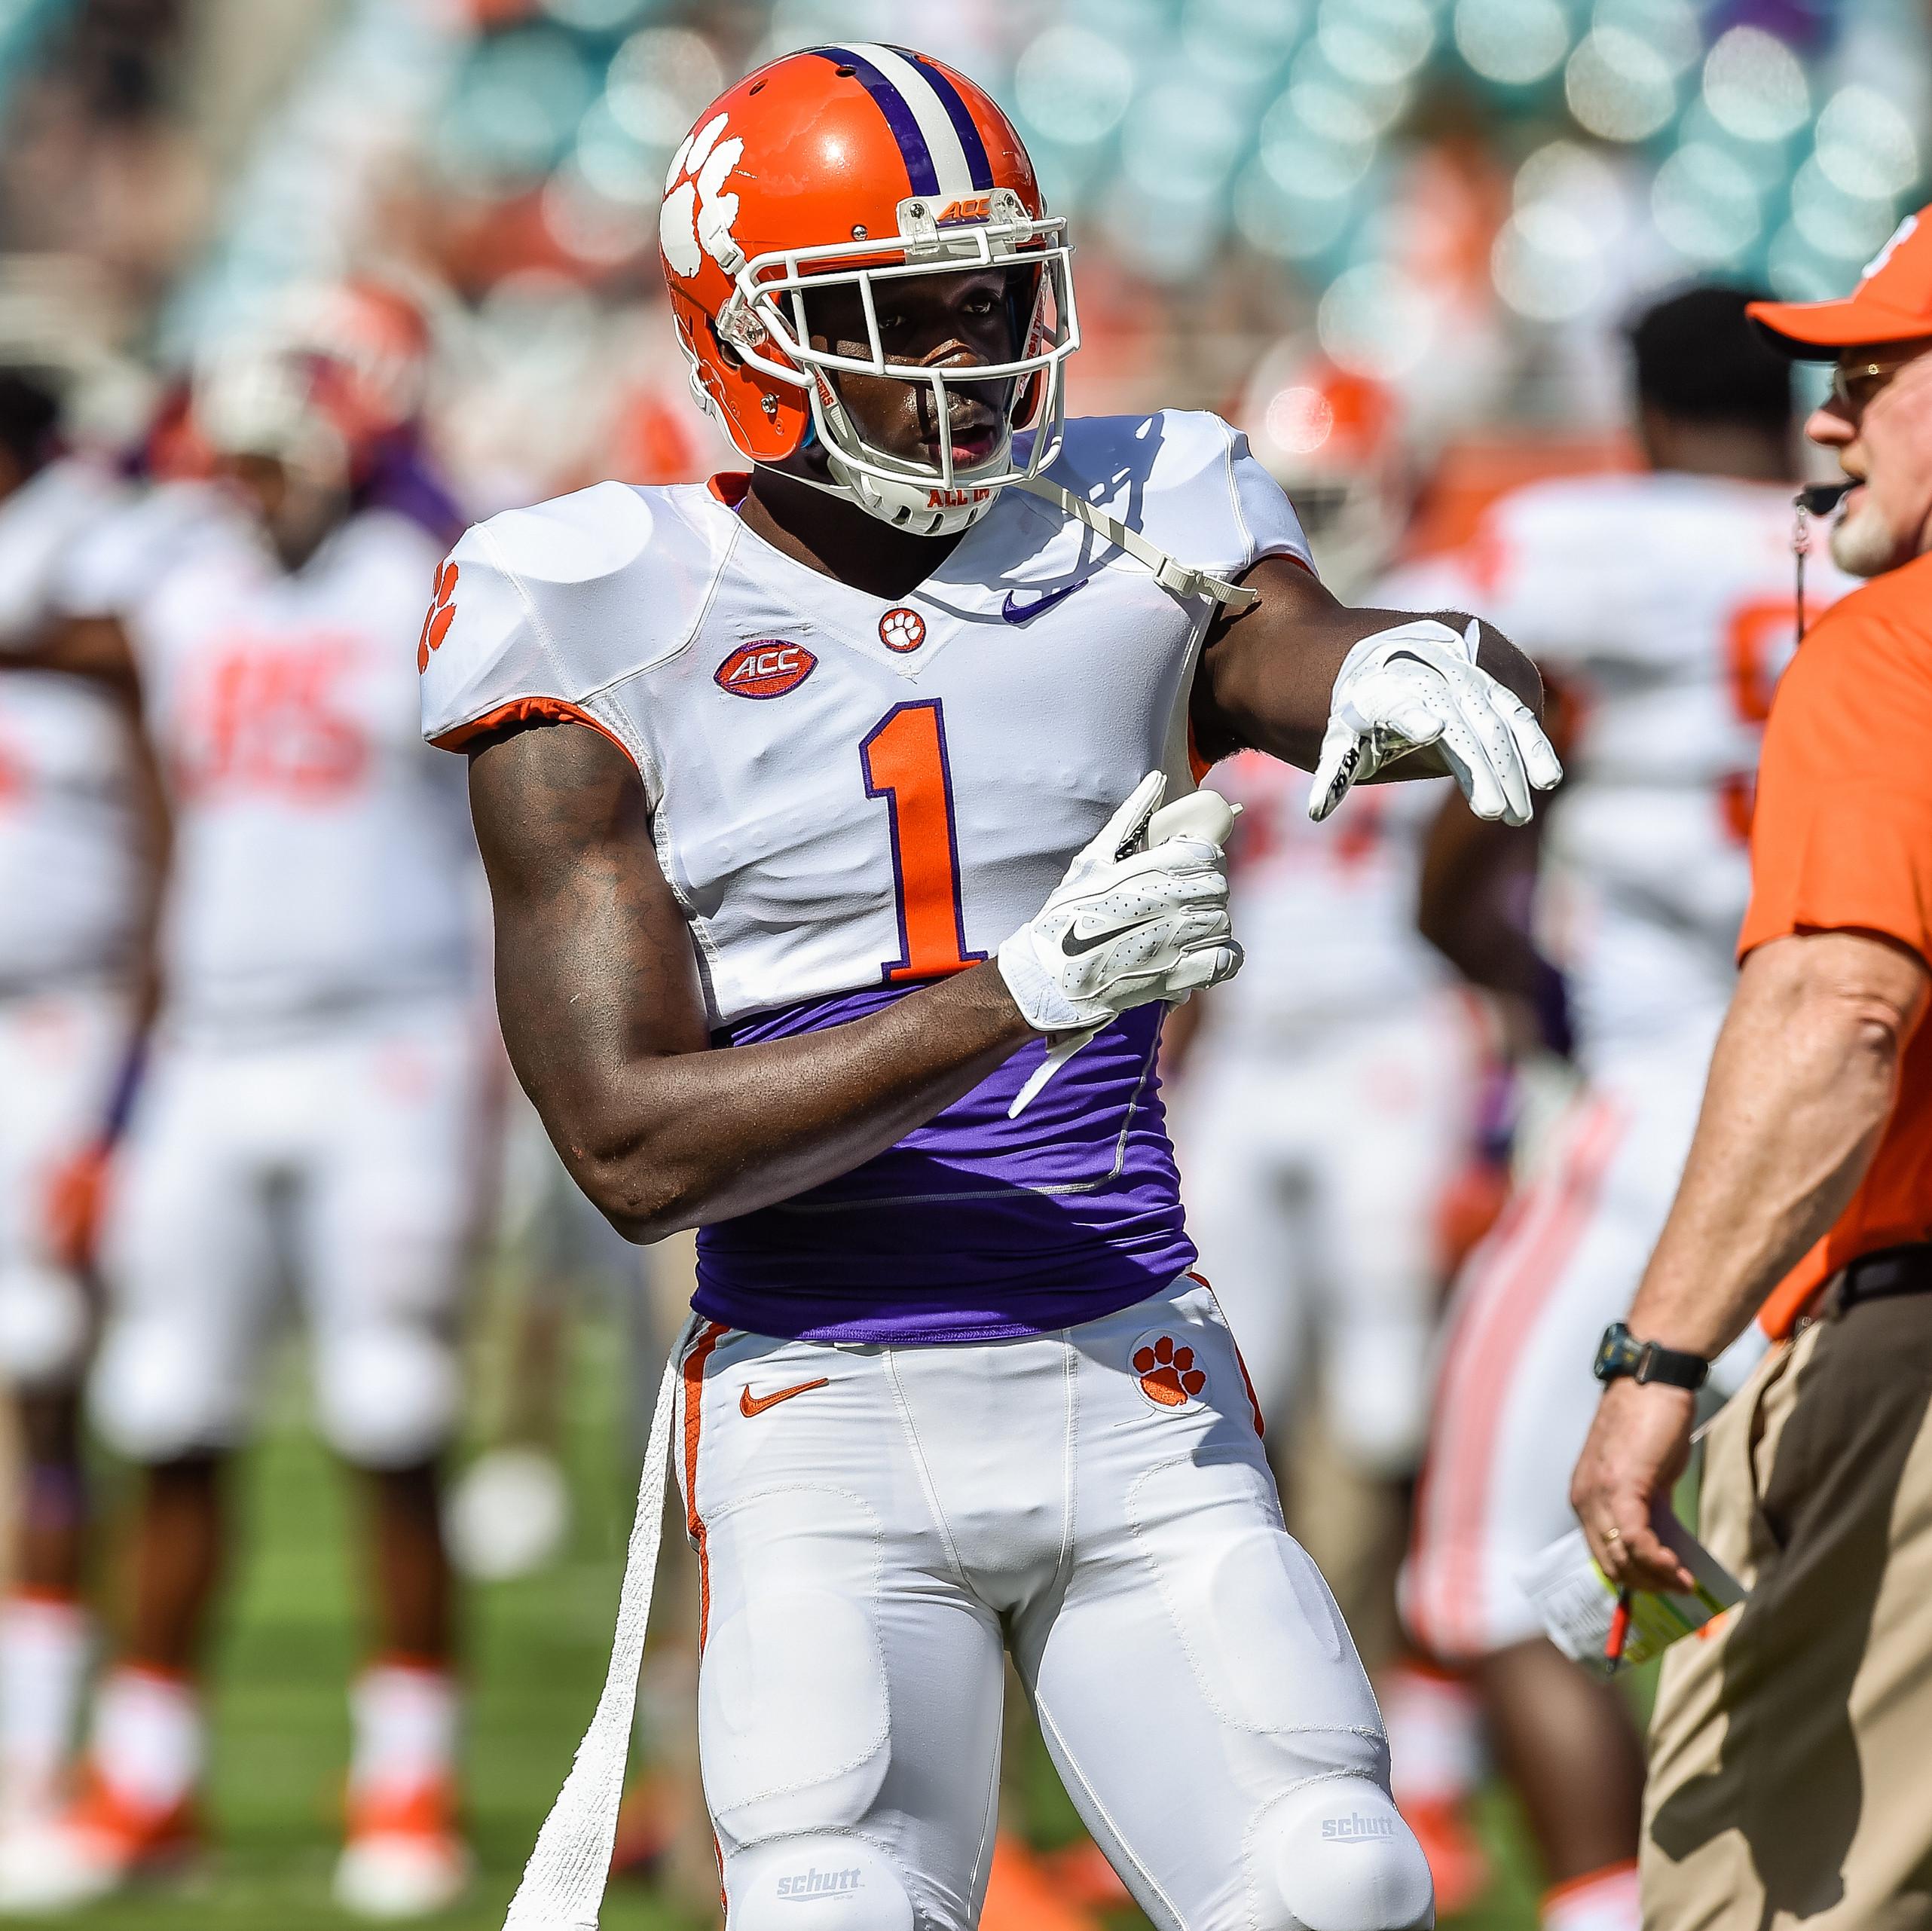 Draft Watch: Jayron Kearse